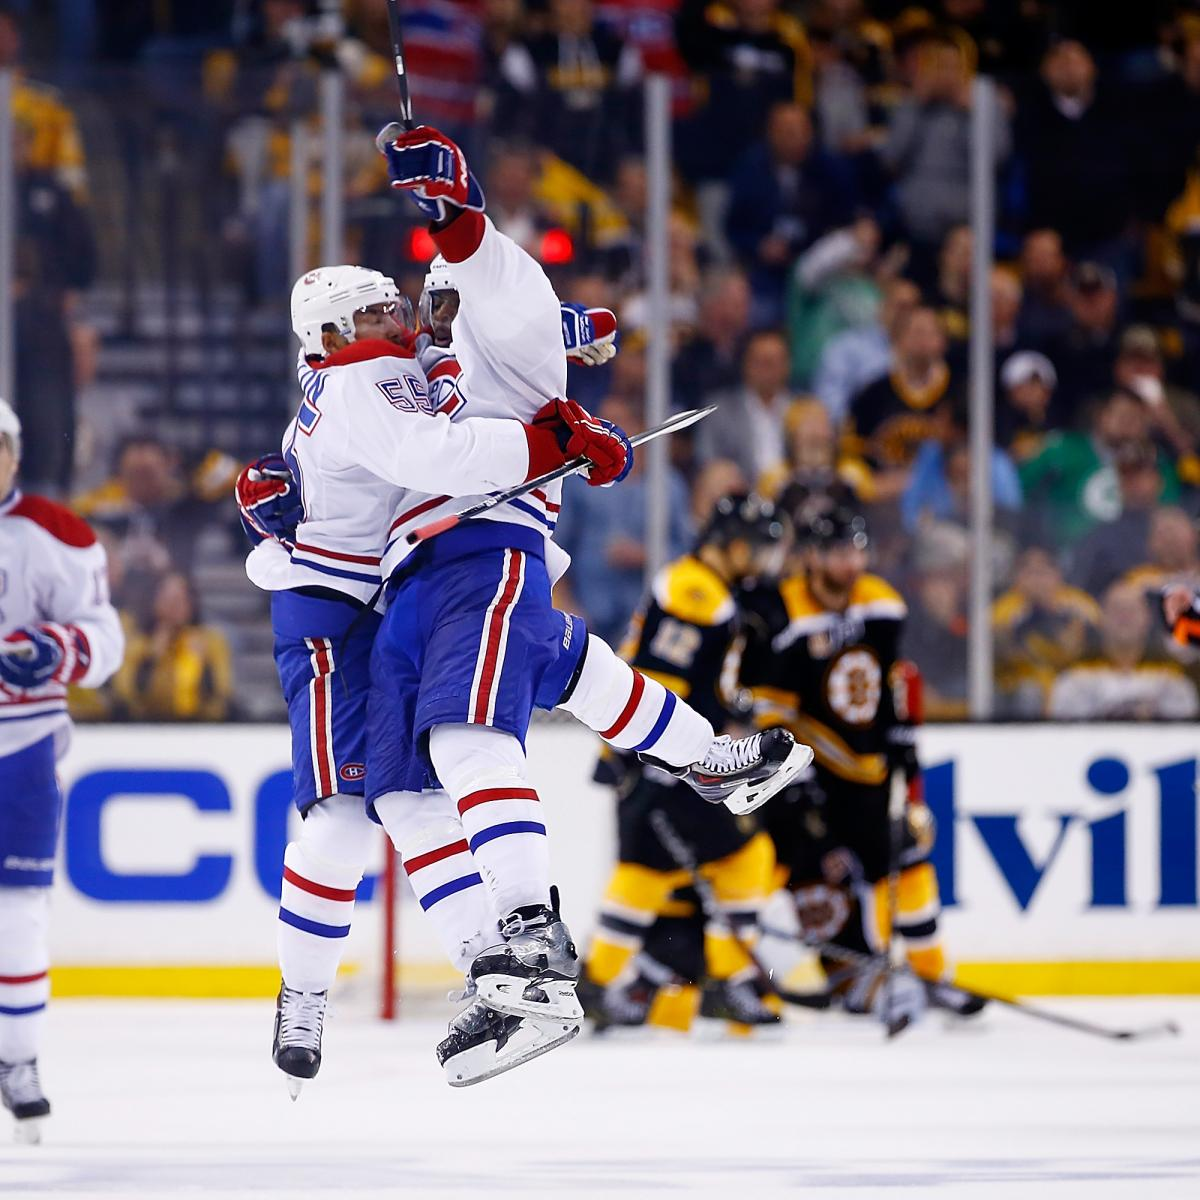 Montreal Canadiens Vs. Boston Bruins Game 1: Live Score